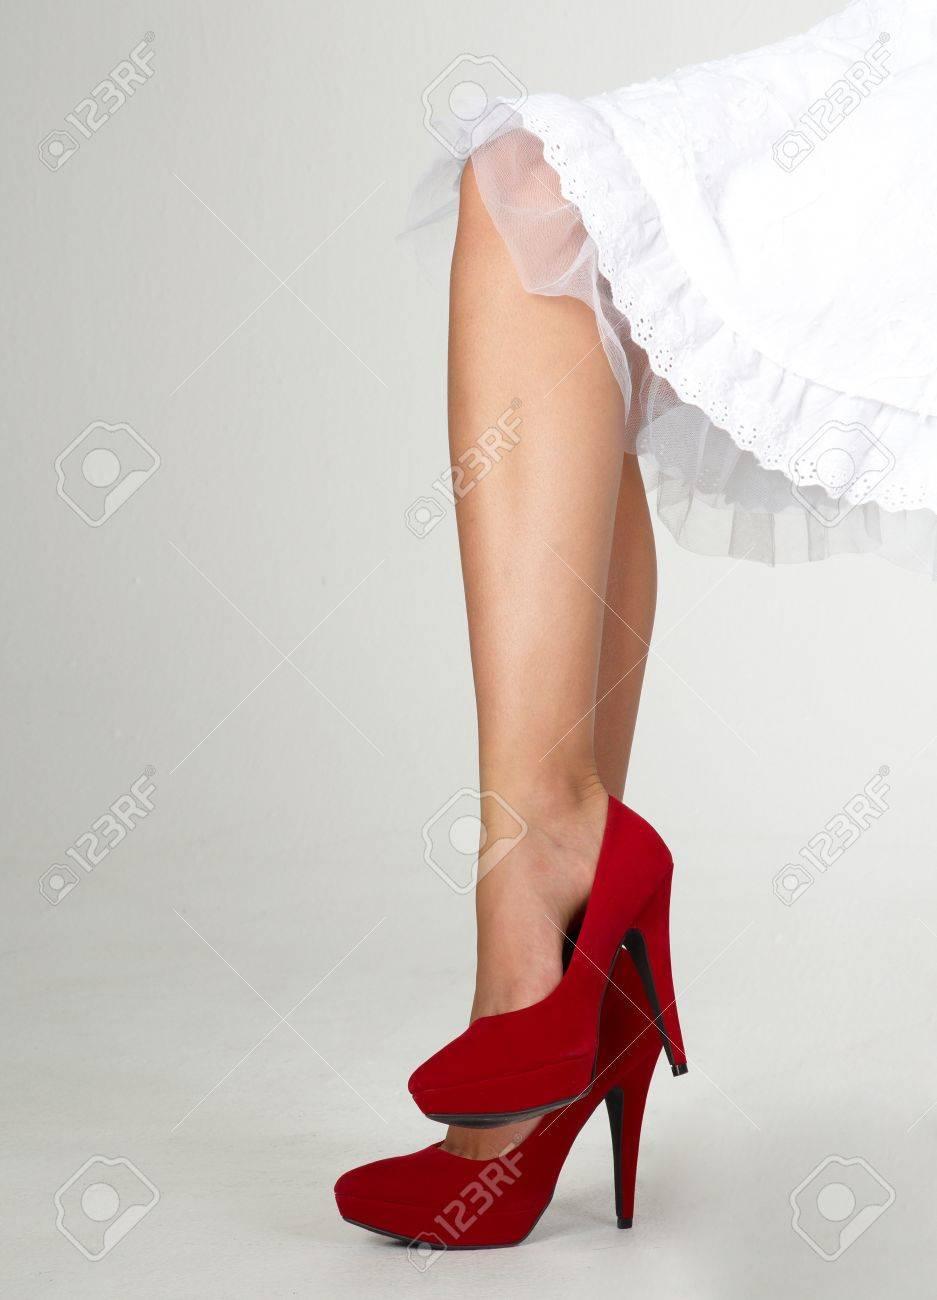 Woman s Crossed Legs Wearing Red High Heels Stock Photo - 15286506